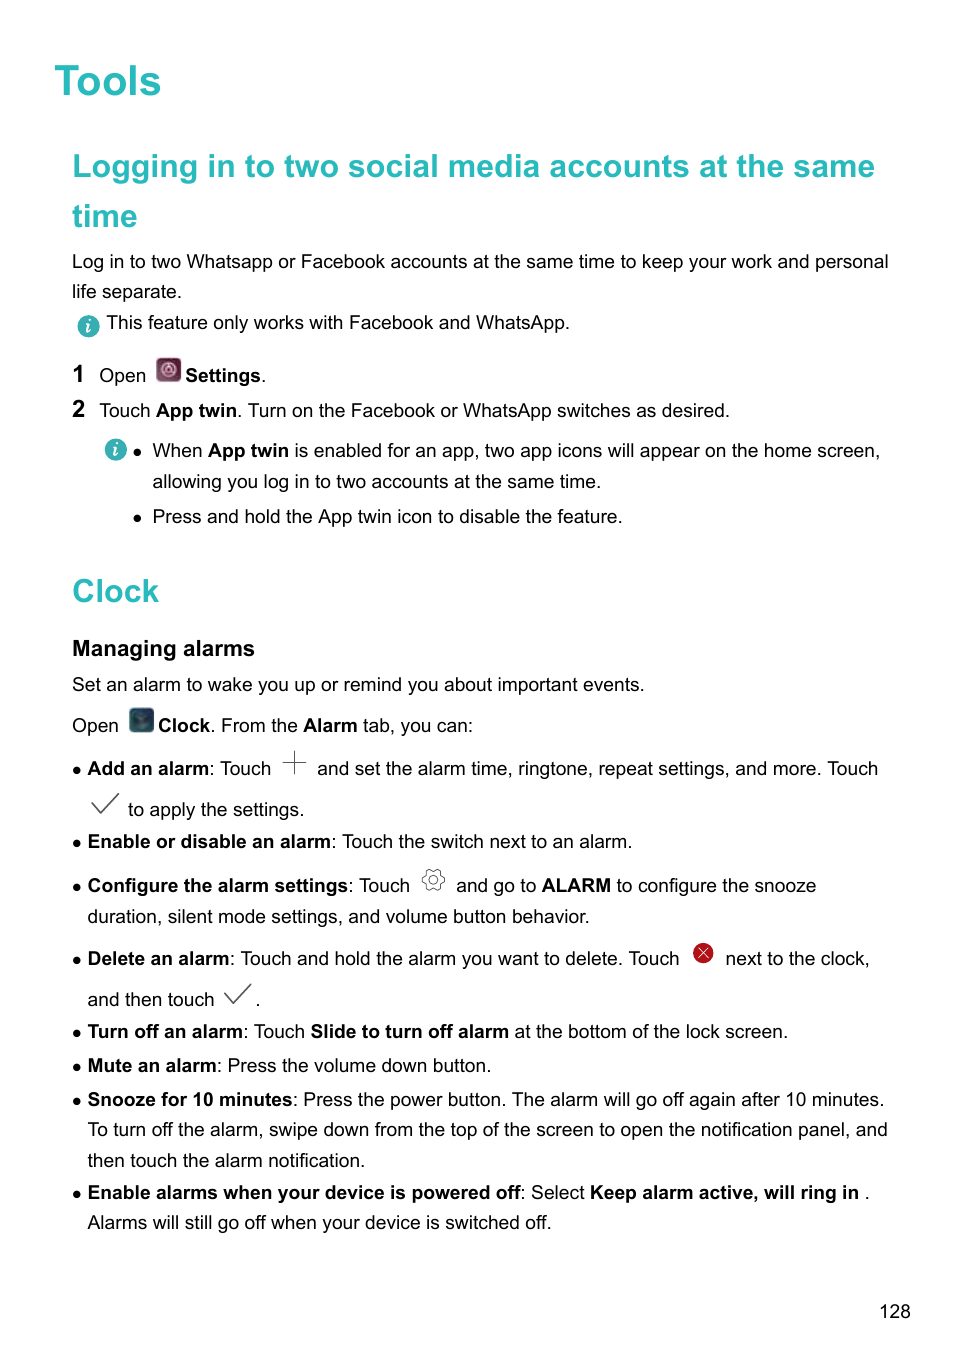 Tools, Clock, Managing alarms   Huawei P10 User Manual   Page 134 / 158